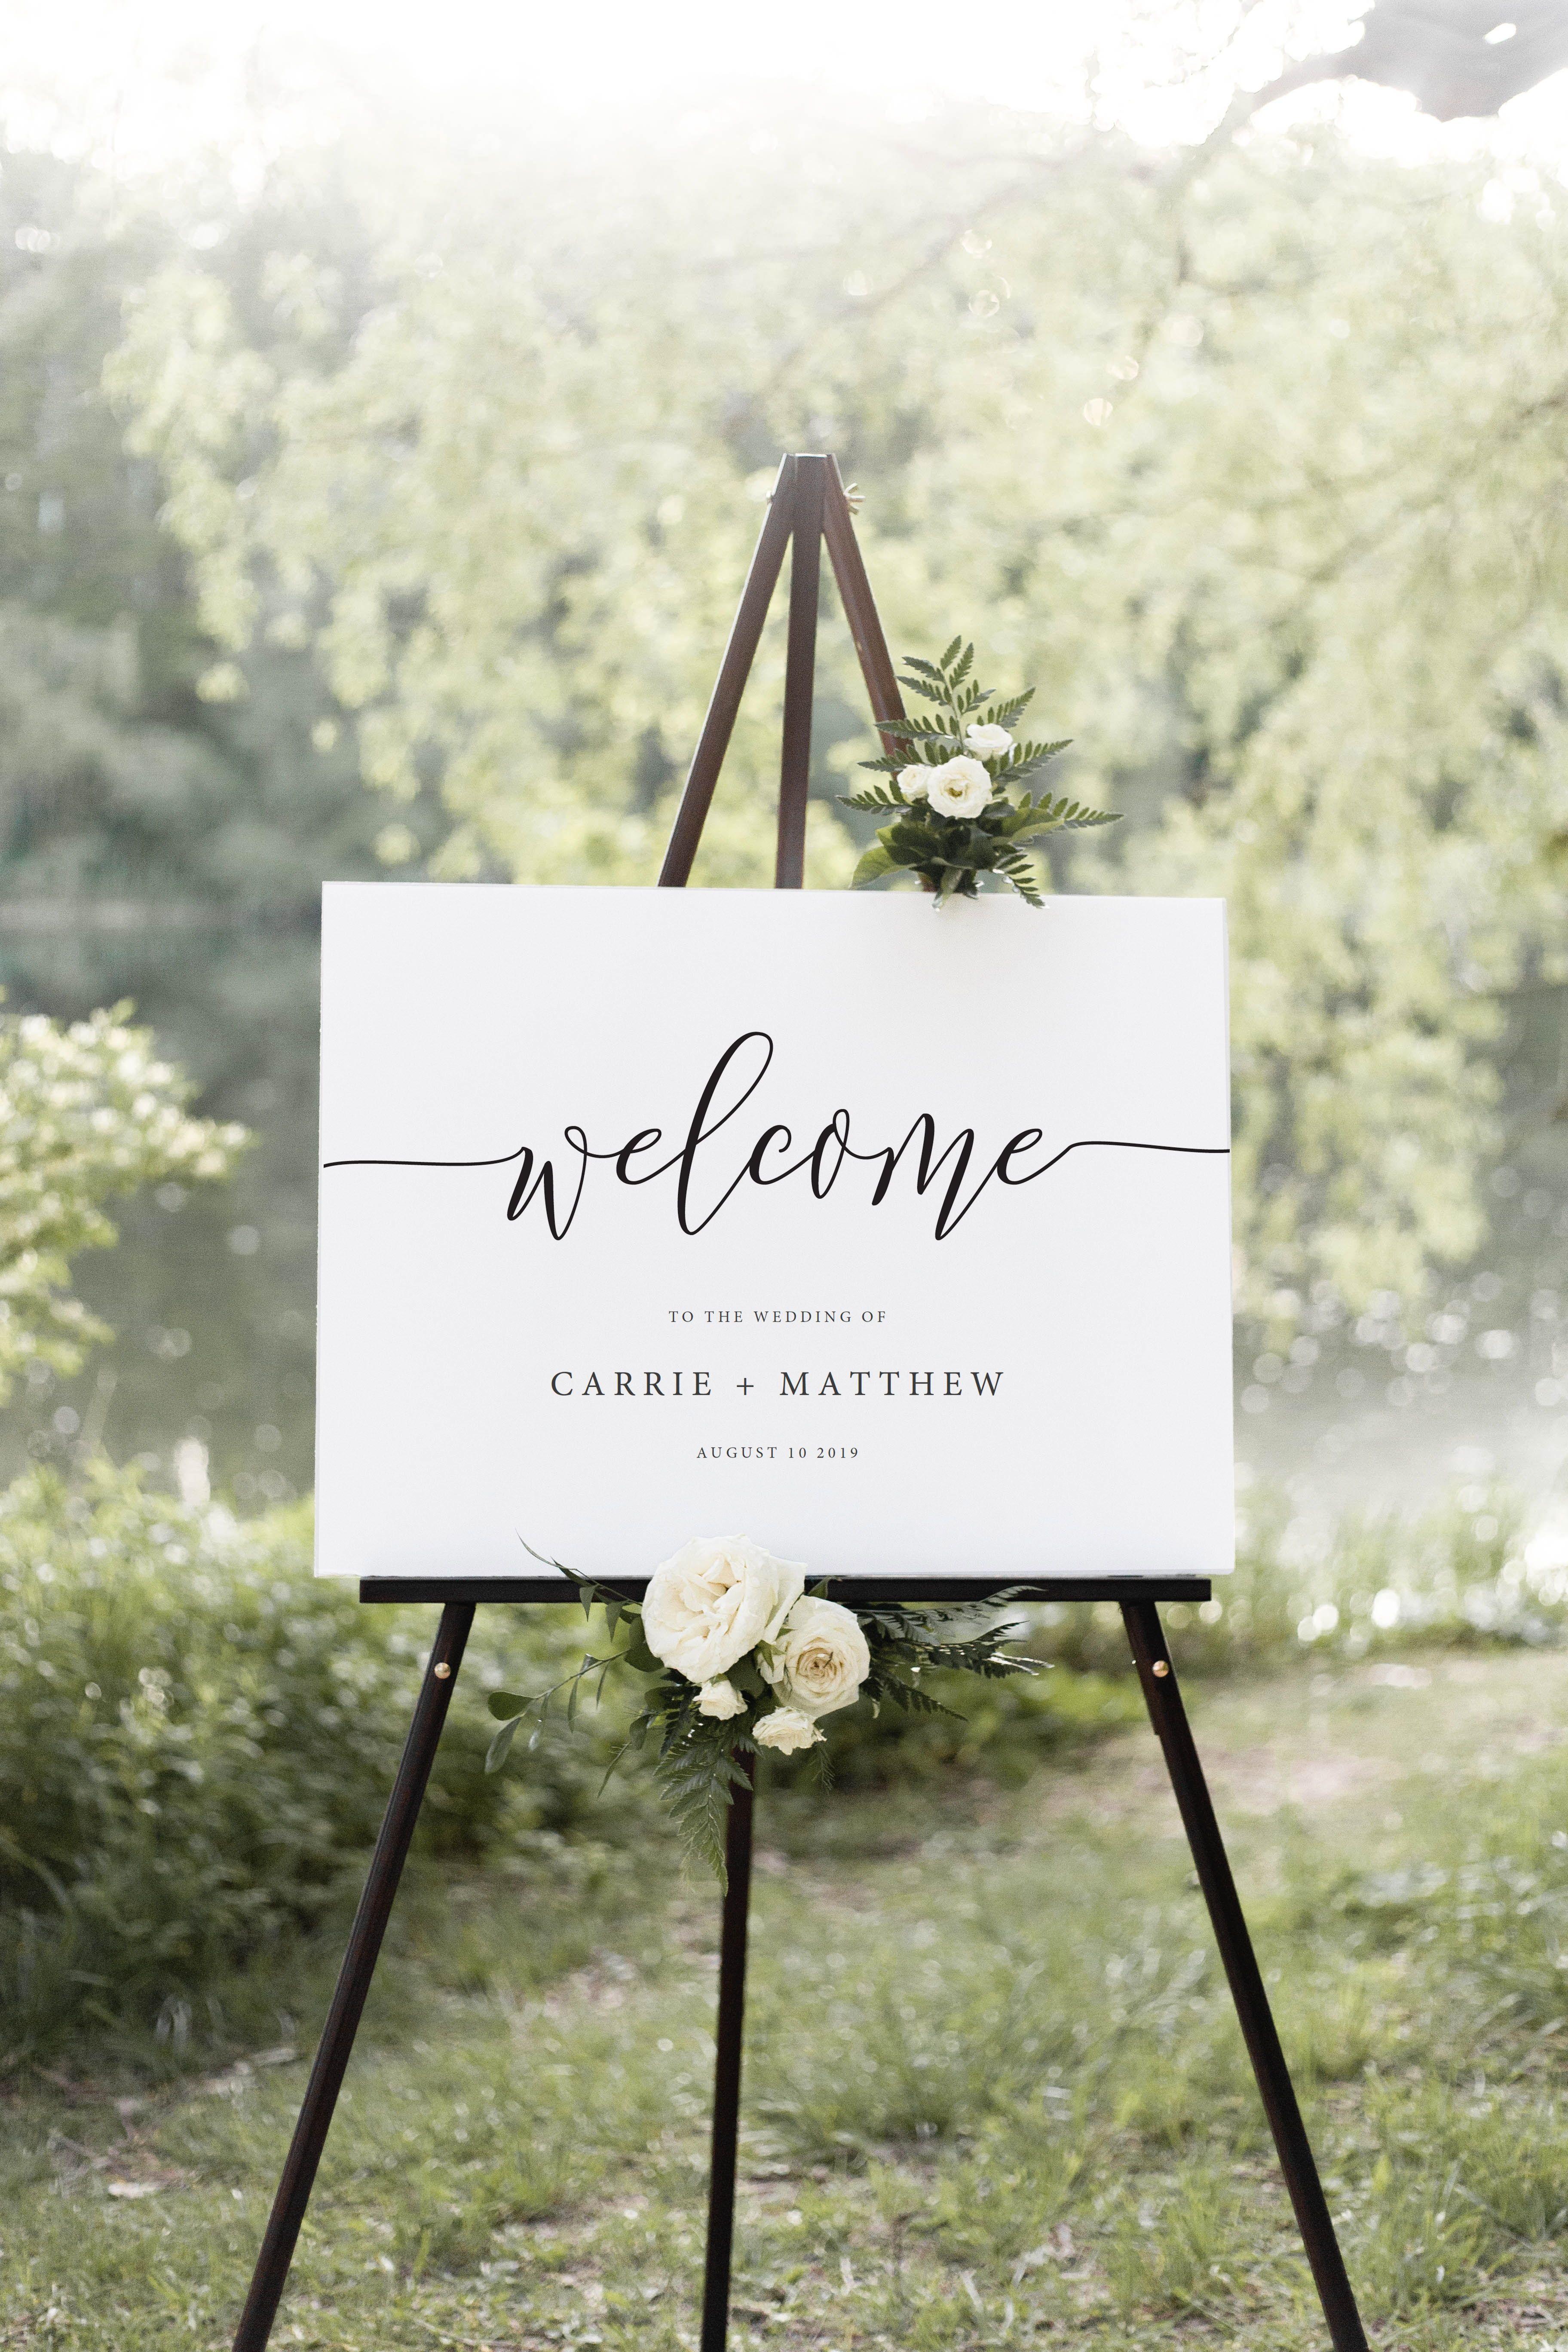 Editable Wedding Welcome Sign Template - Printable Wedding Welcome Sign - Rustic Elegance - Instant Download - PTC01